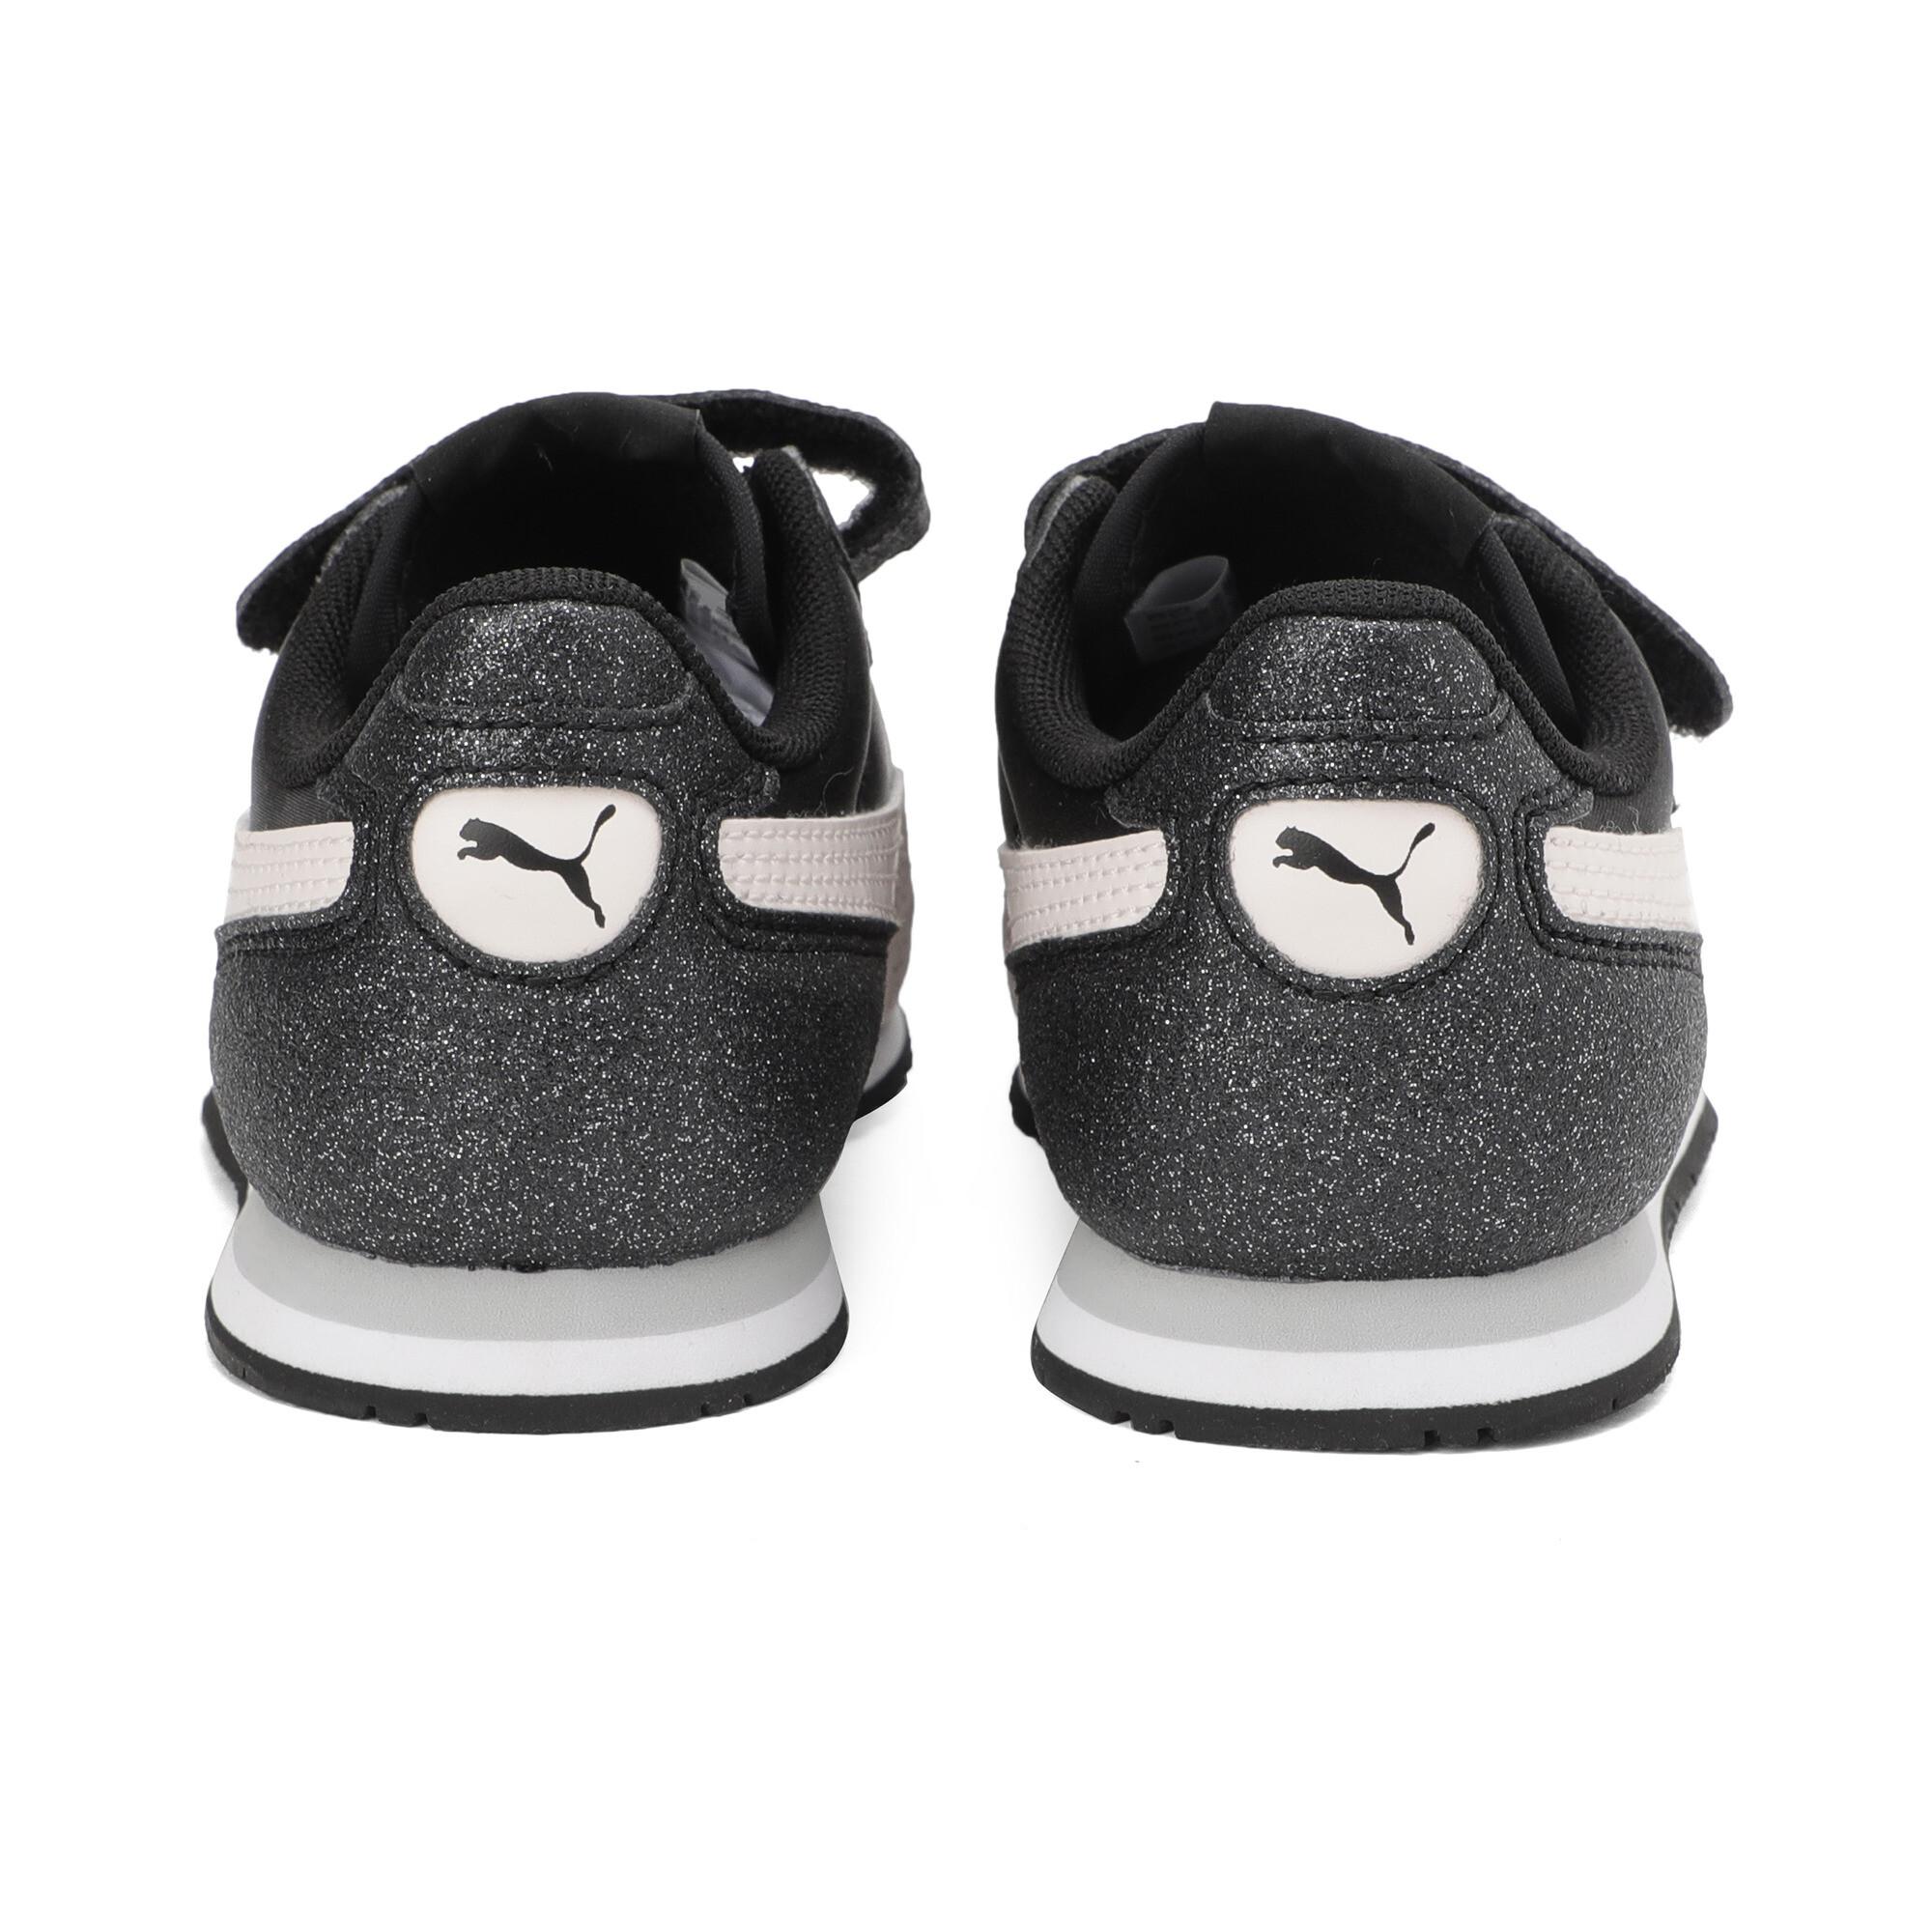 PUMA-Pre-School-Girl-039-s-Cabana-Racer-Glitz-AC-Shoes thumbnail 15